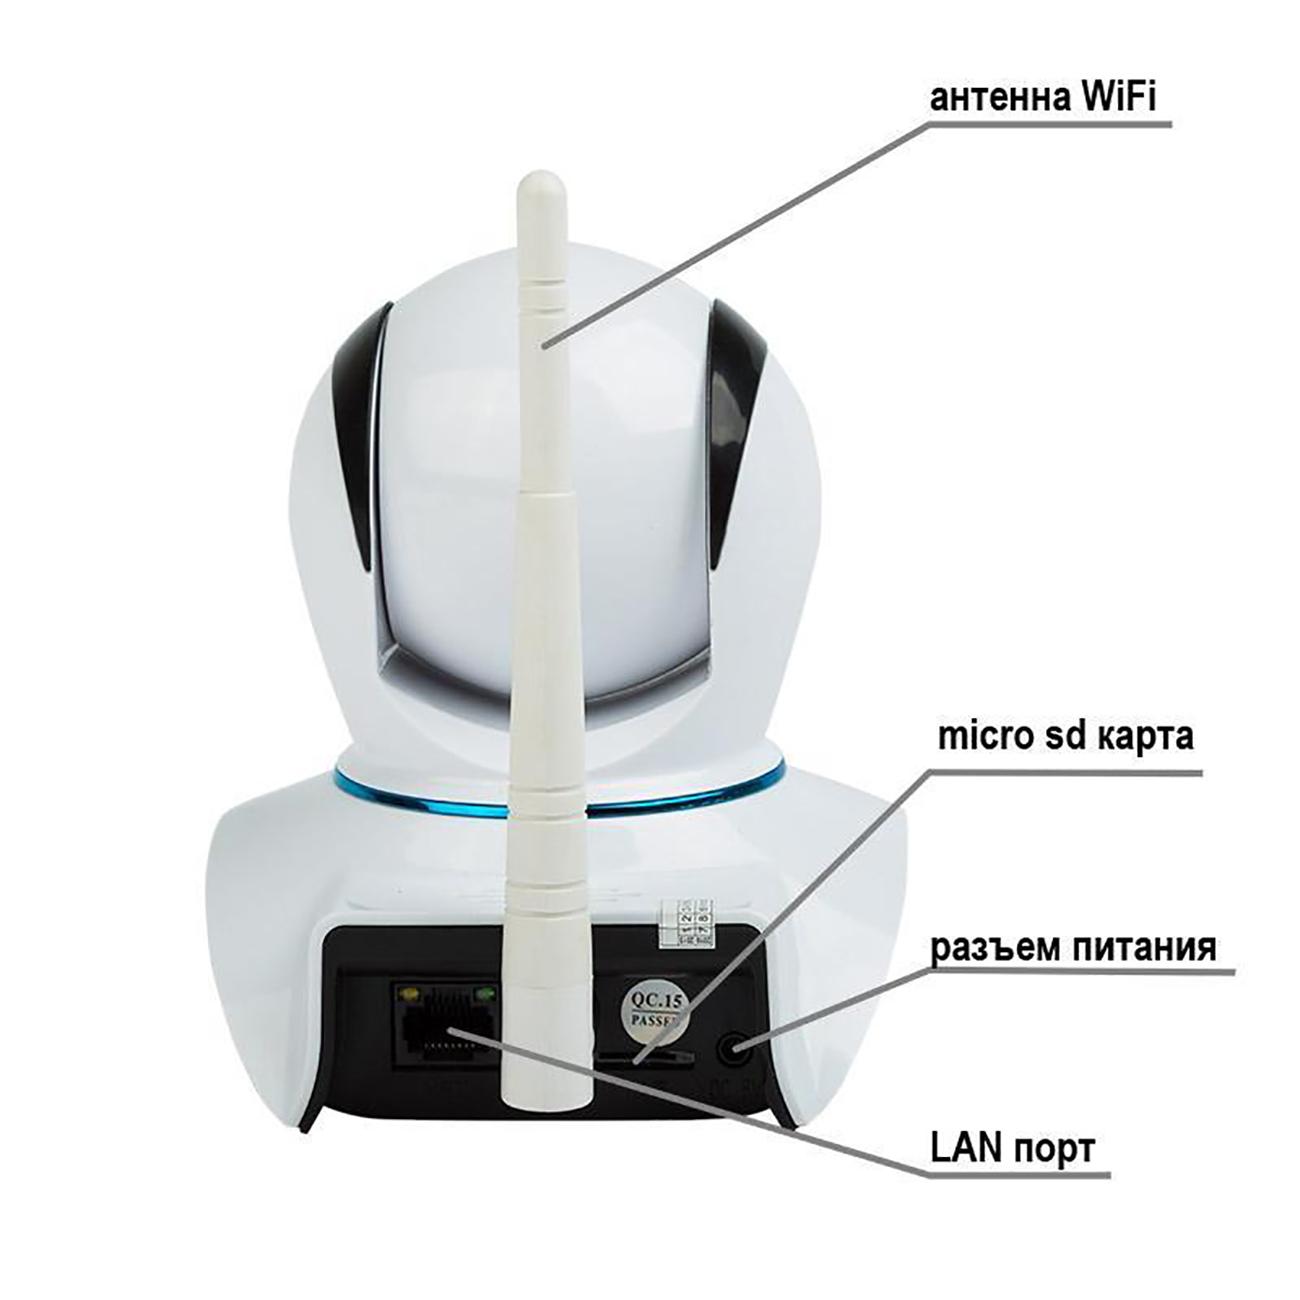 Фото Беспроводная поворотная камера WiFi Smart Rexant 1.0 Мп, (720P), ИК 10 м {45-0275} (2)